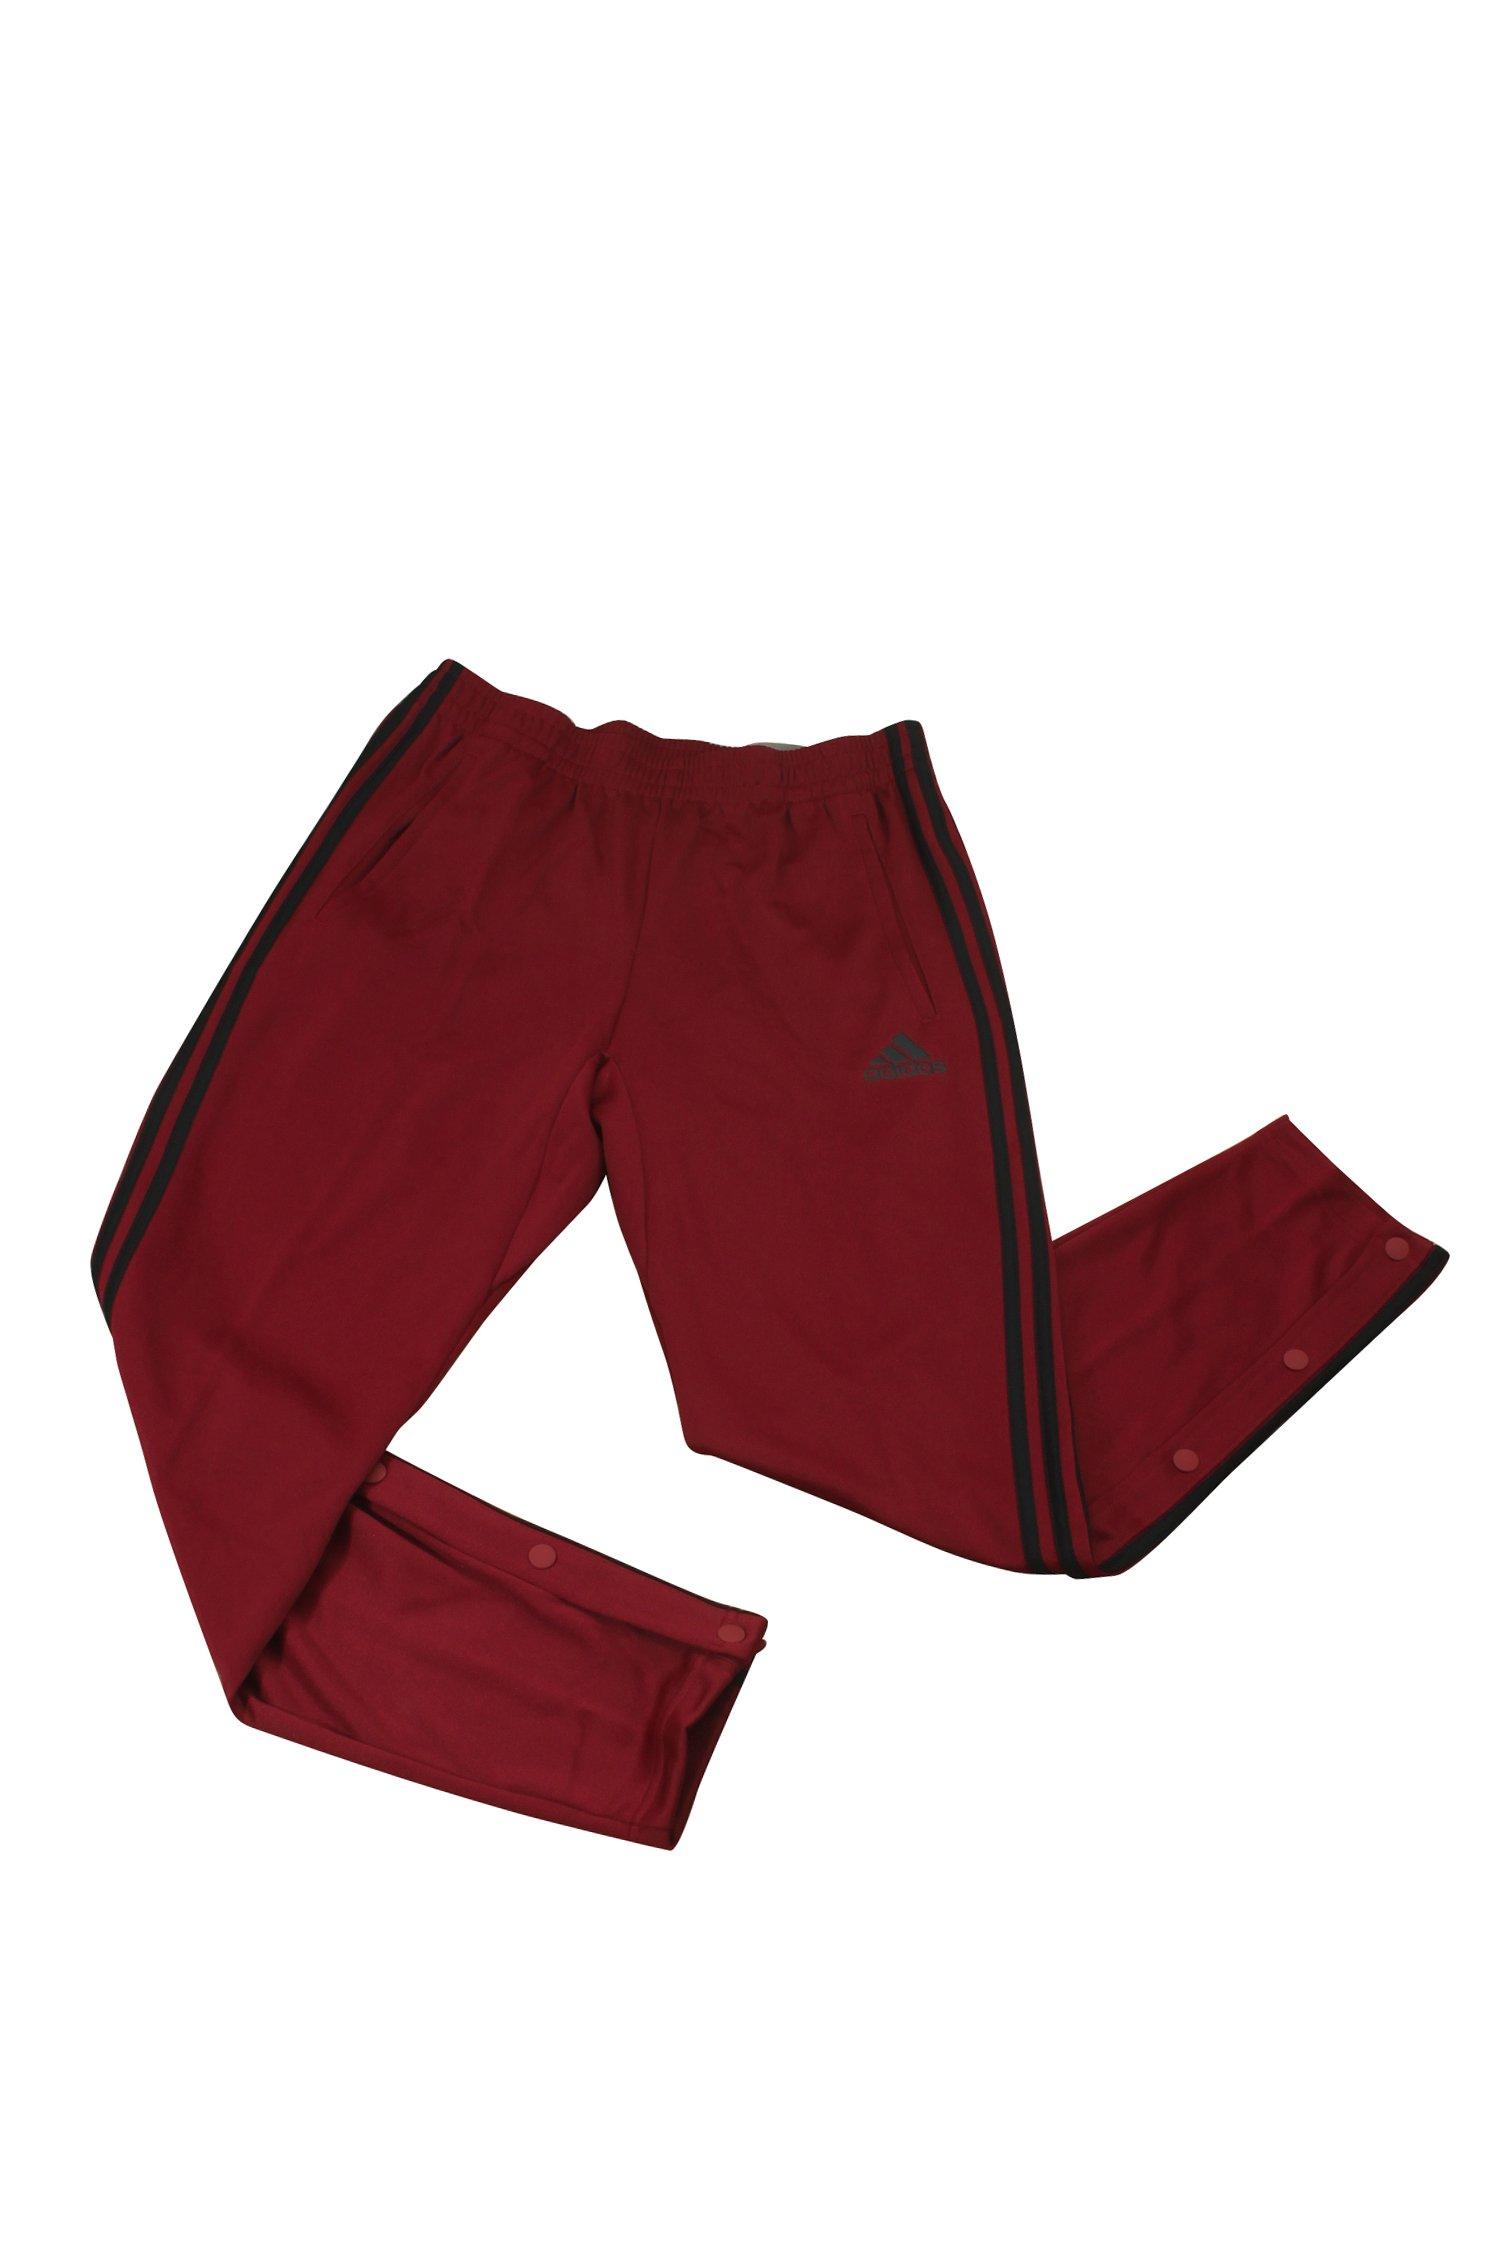 adidas Men's Sport ID Track Pants Collegiate Burgundy X-Large 29.5